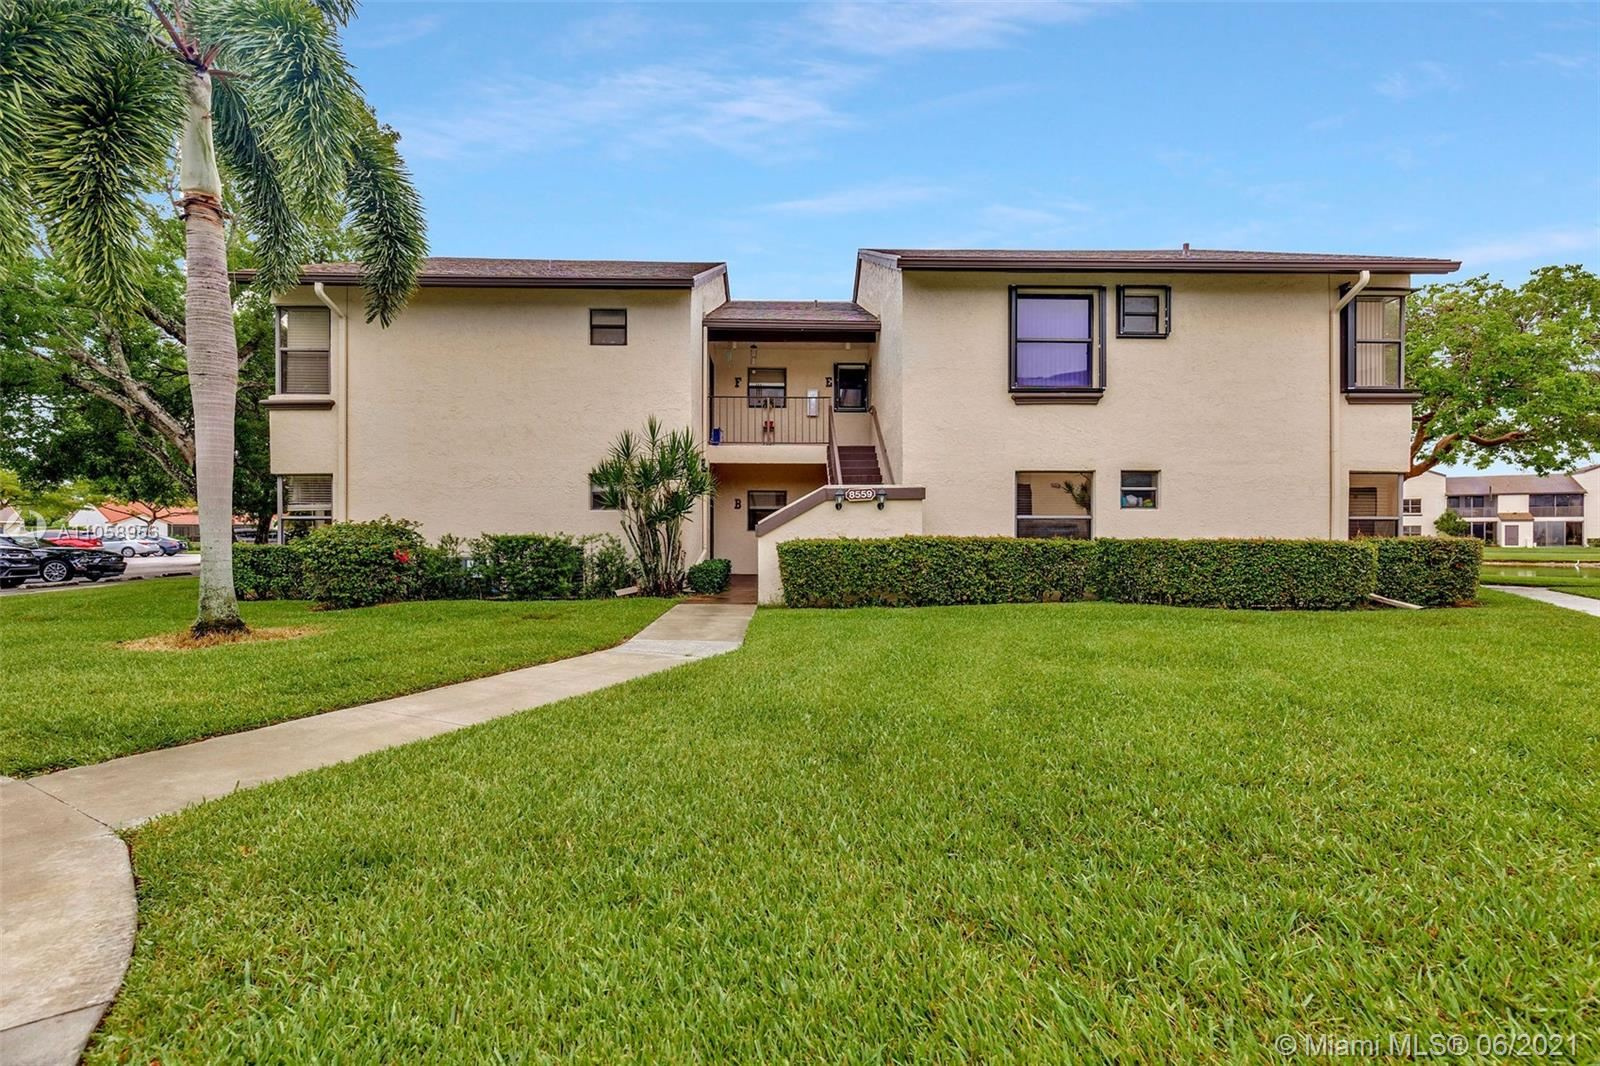 8559 W Boca Glades Blvd W #B, Boca Raton, FL 33434 - #: A11058956